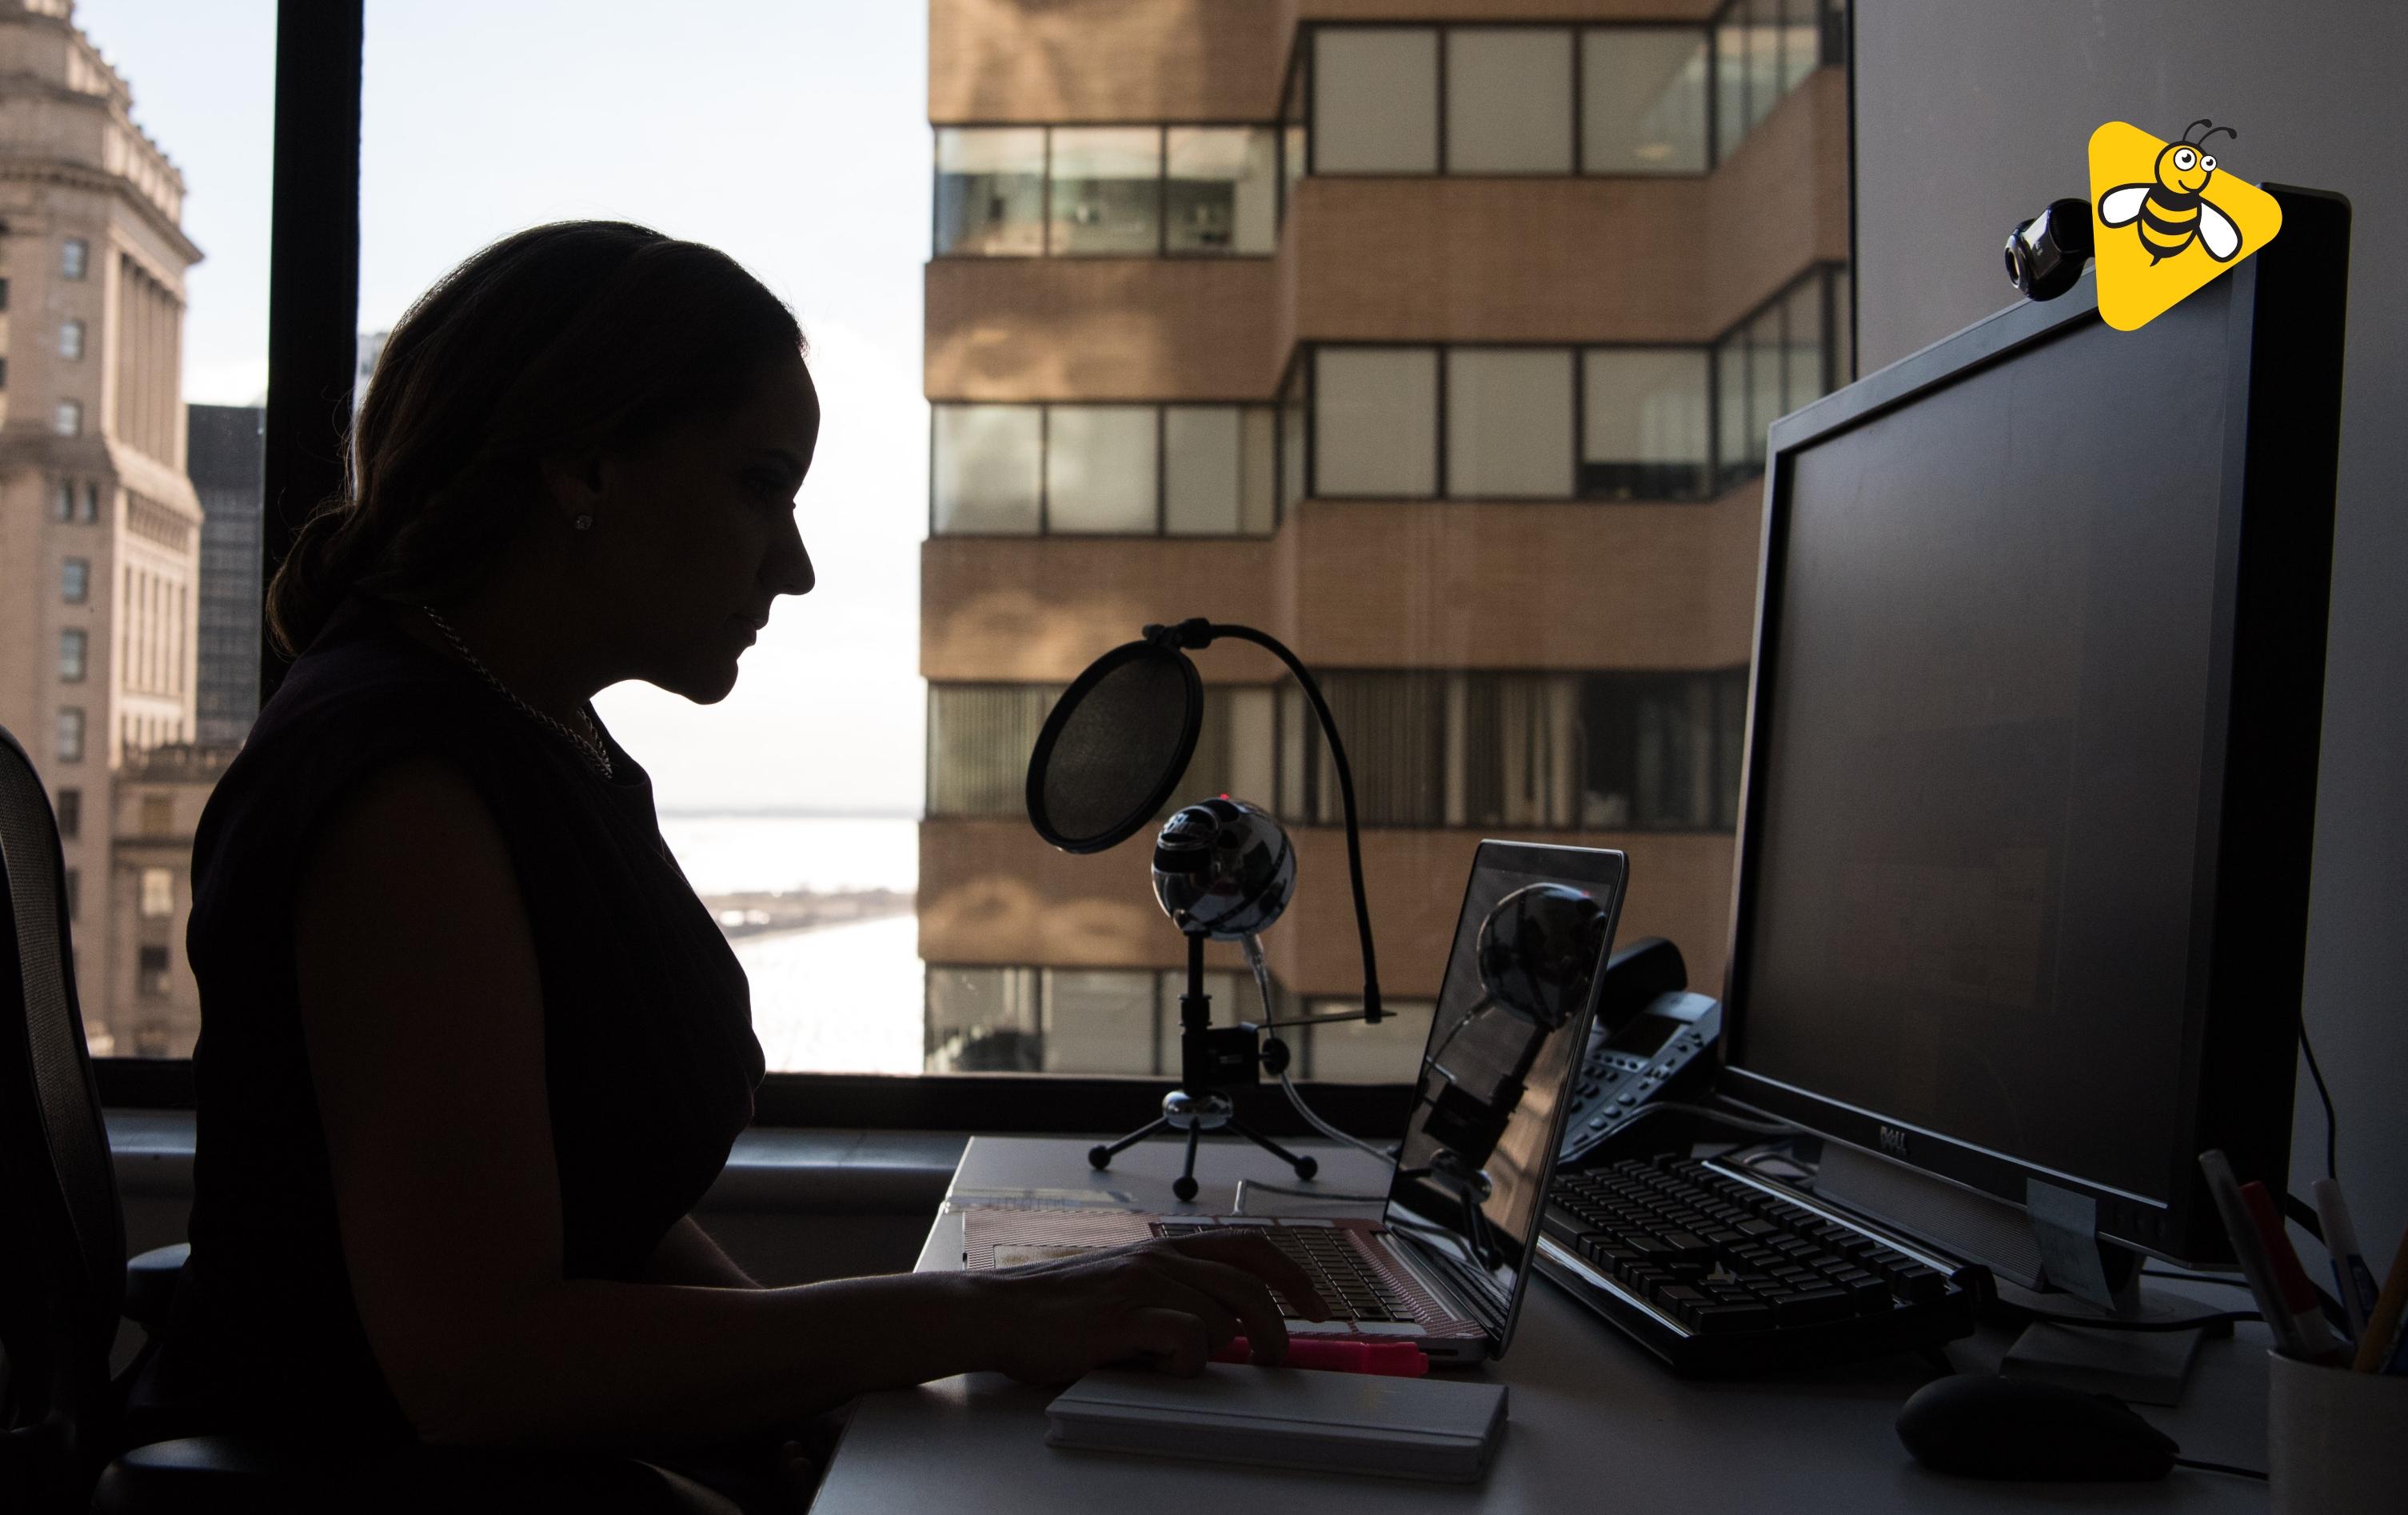 Enabling women entrepreneurs in India | DataBaaz